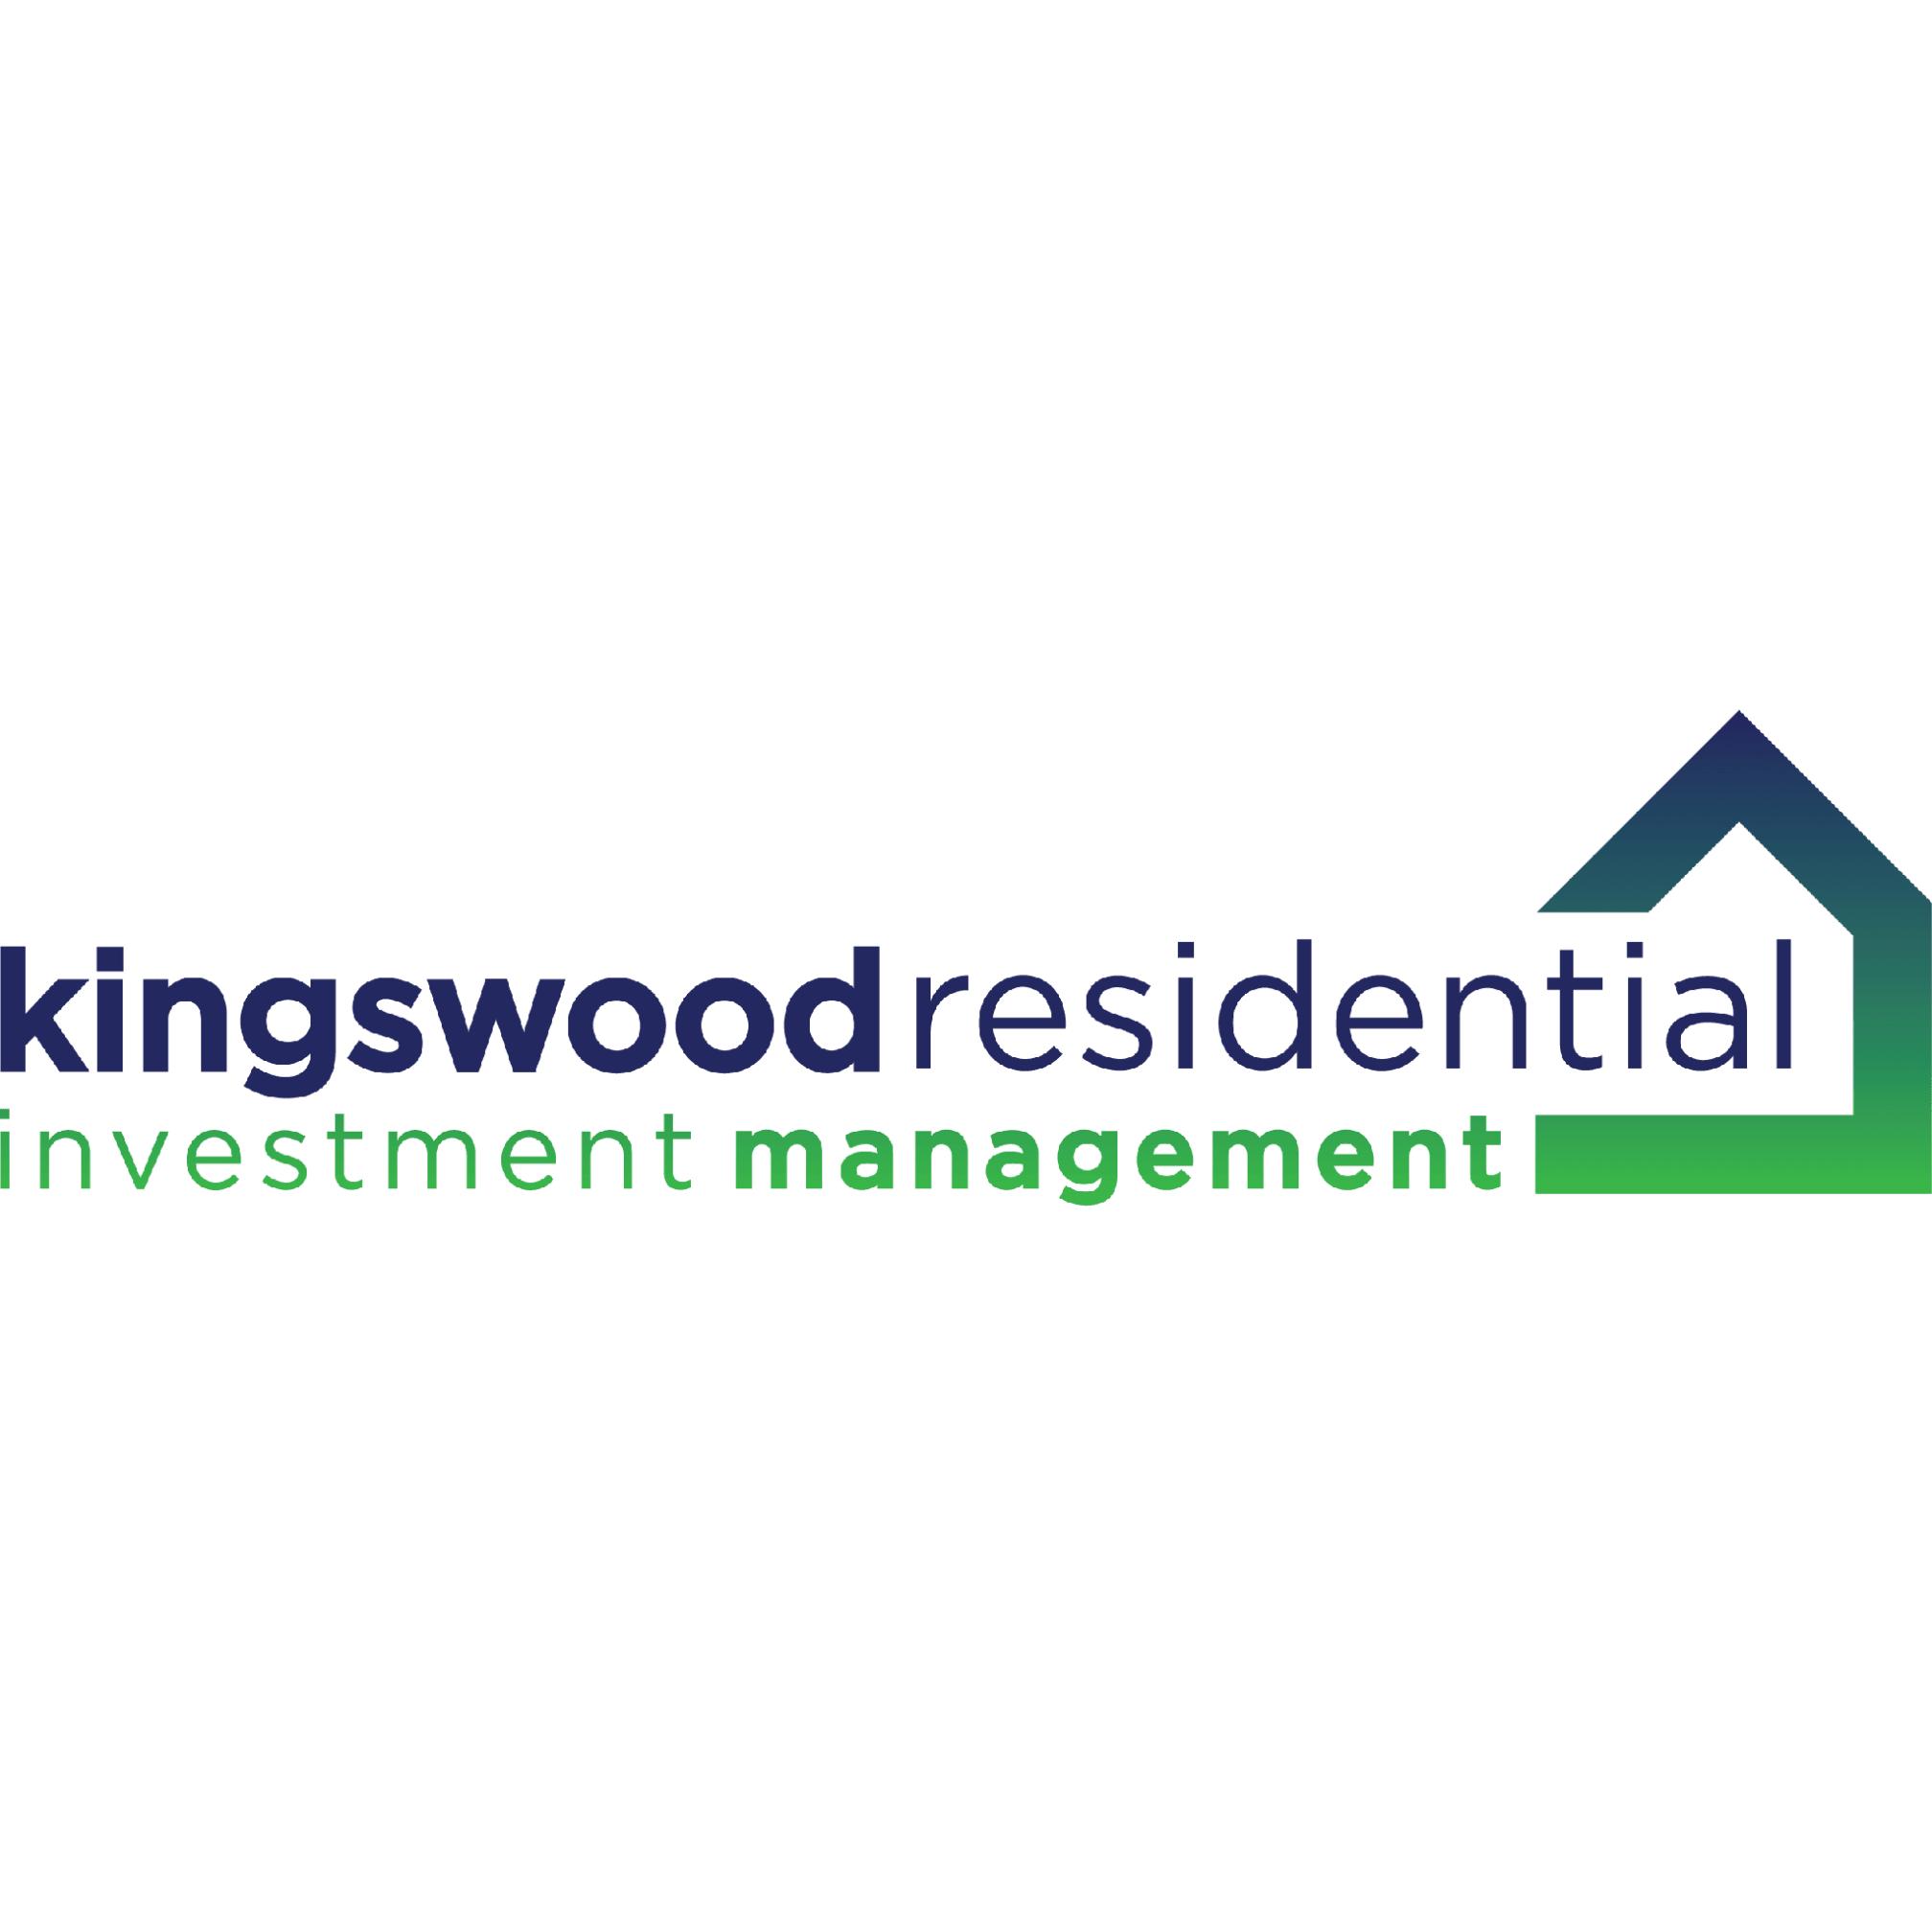 Kingswood Residential Investment Management - Nottingham, Nottinghamshire NG1 5BT - 01157 043163 | ShowMeLocal.com